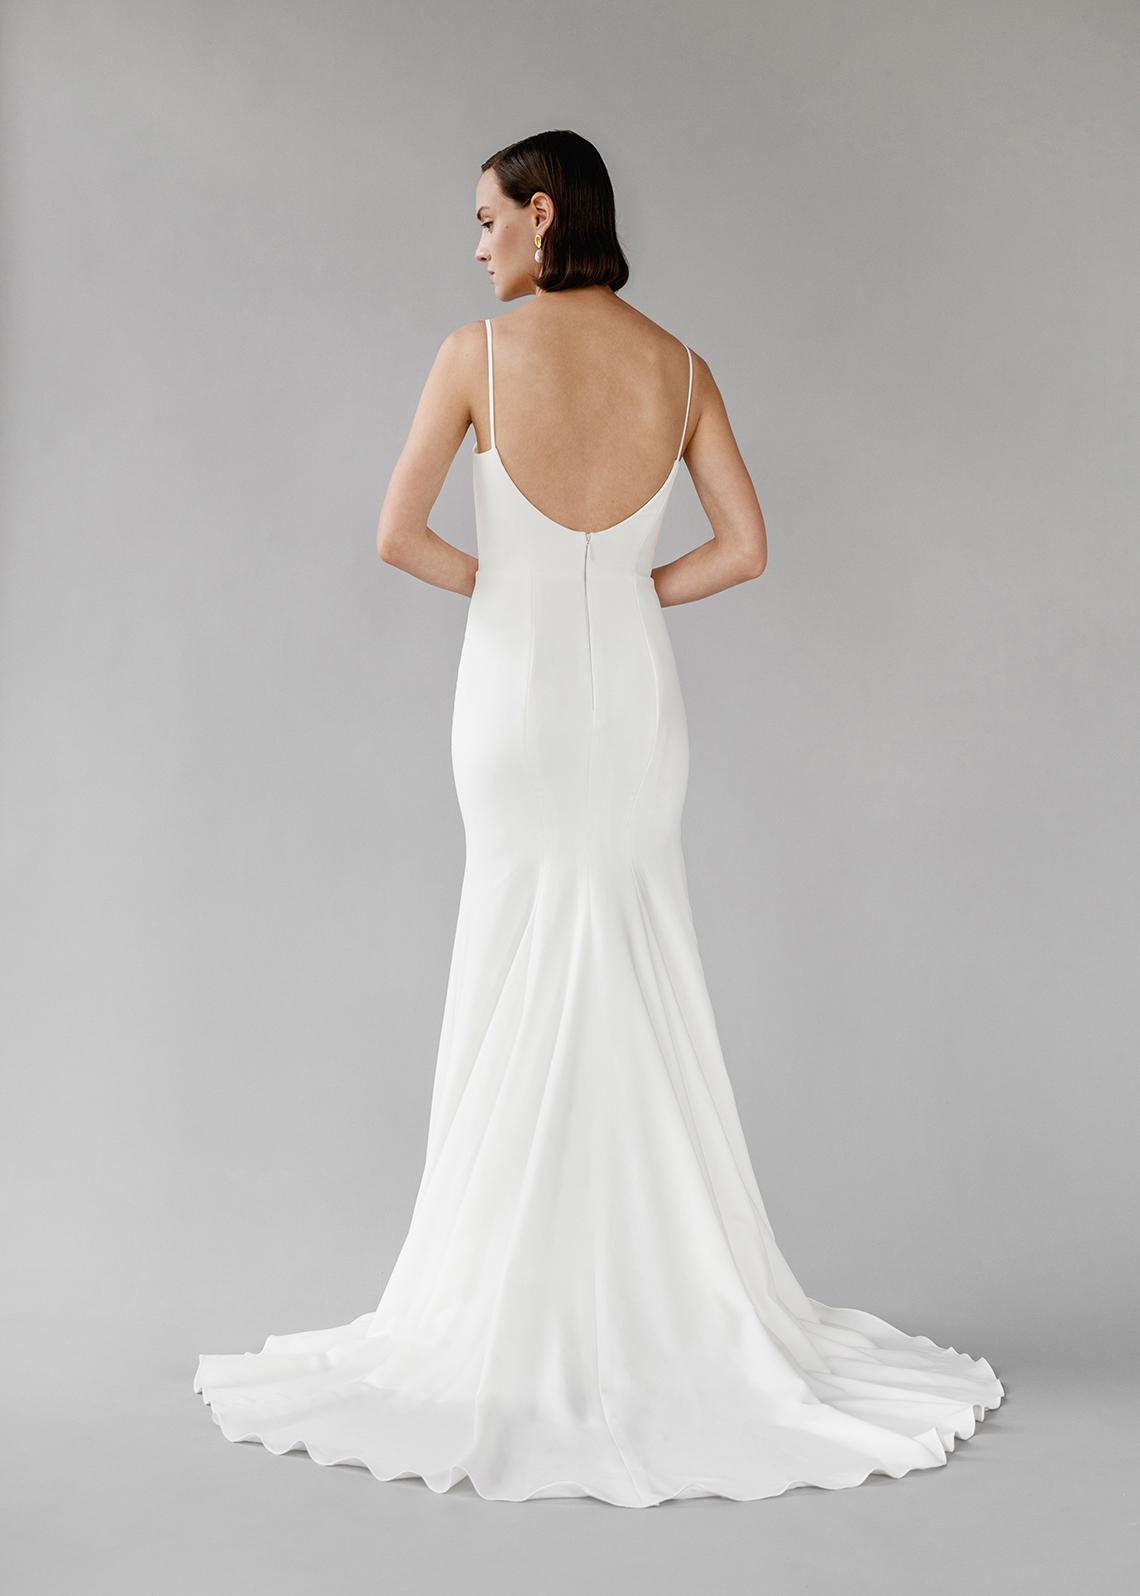 Modern Minimalist 2021 Wedding Dresses by Aesling Bride – Gossamer Dress 3